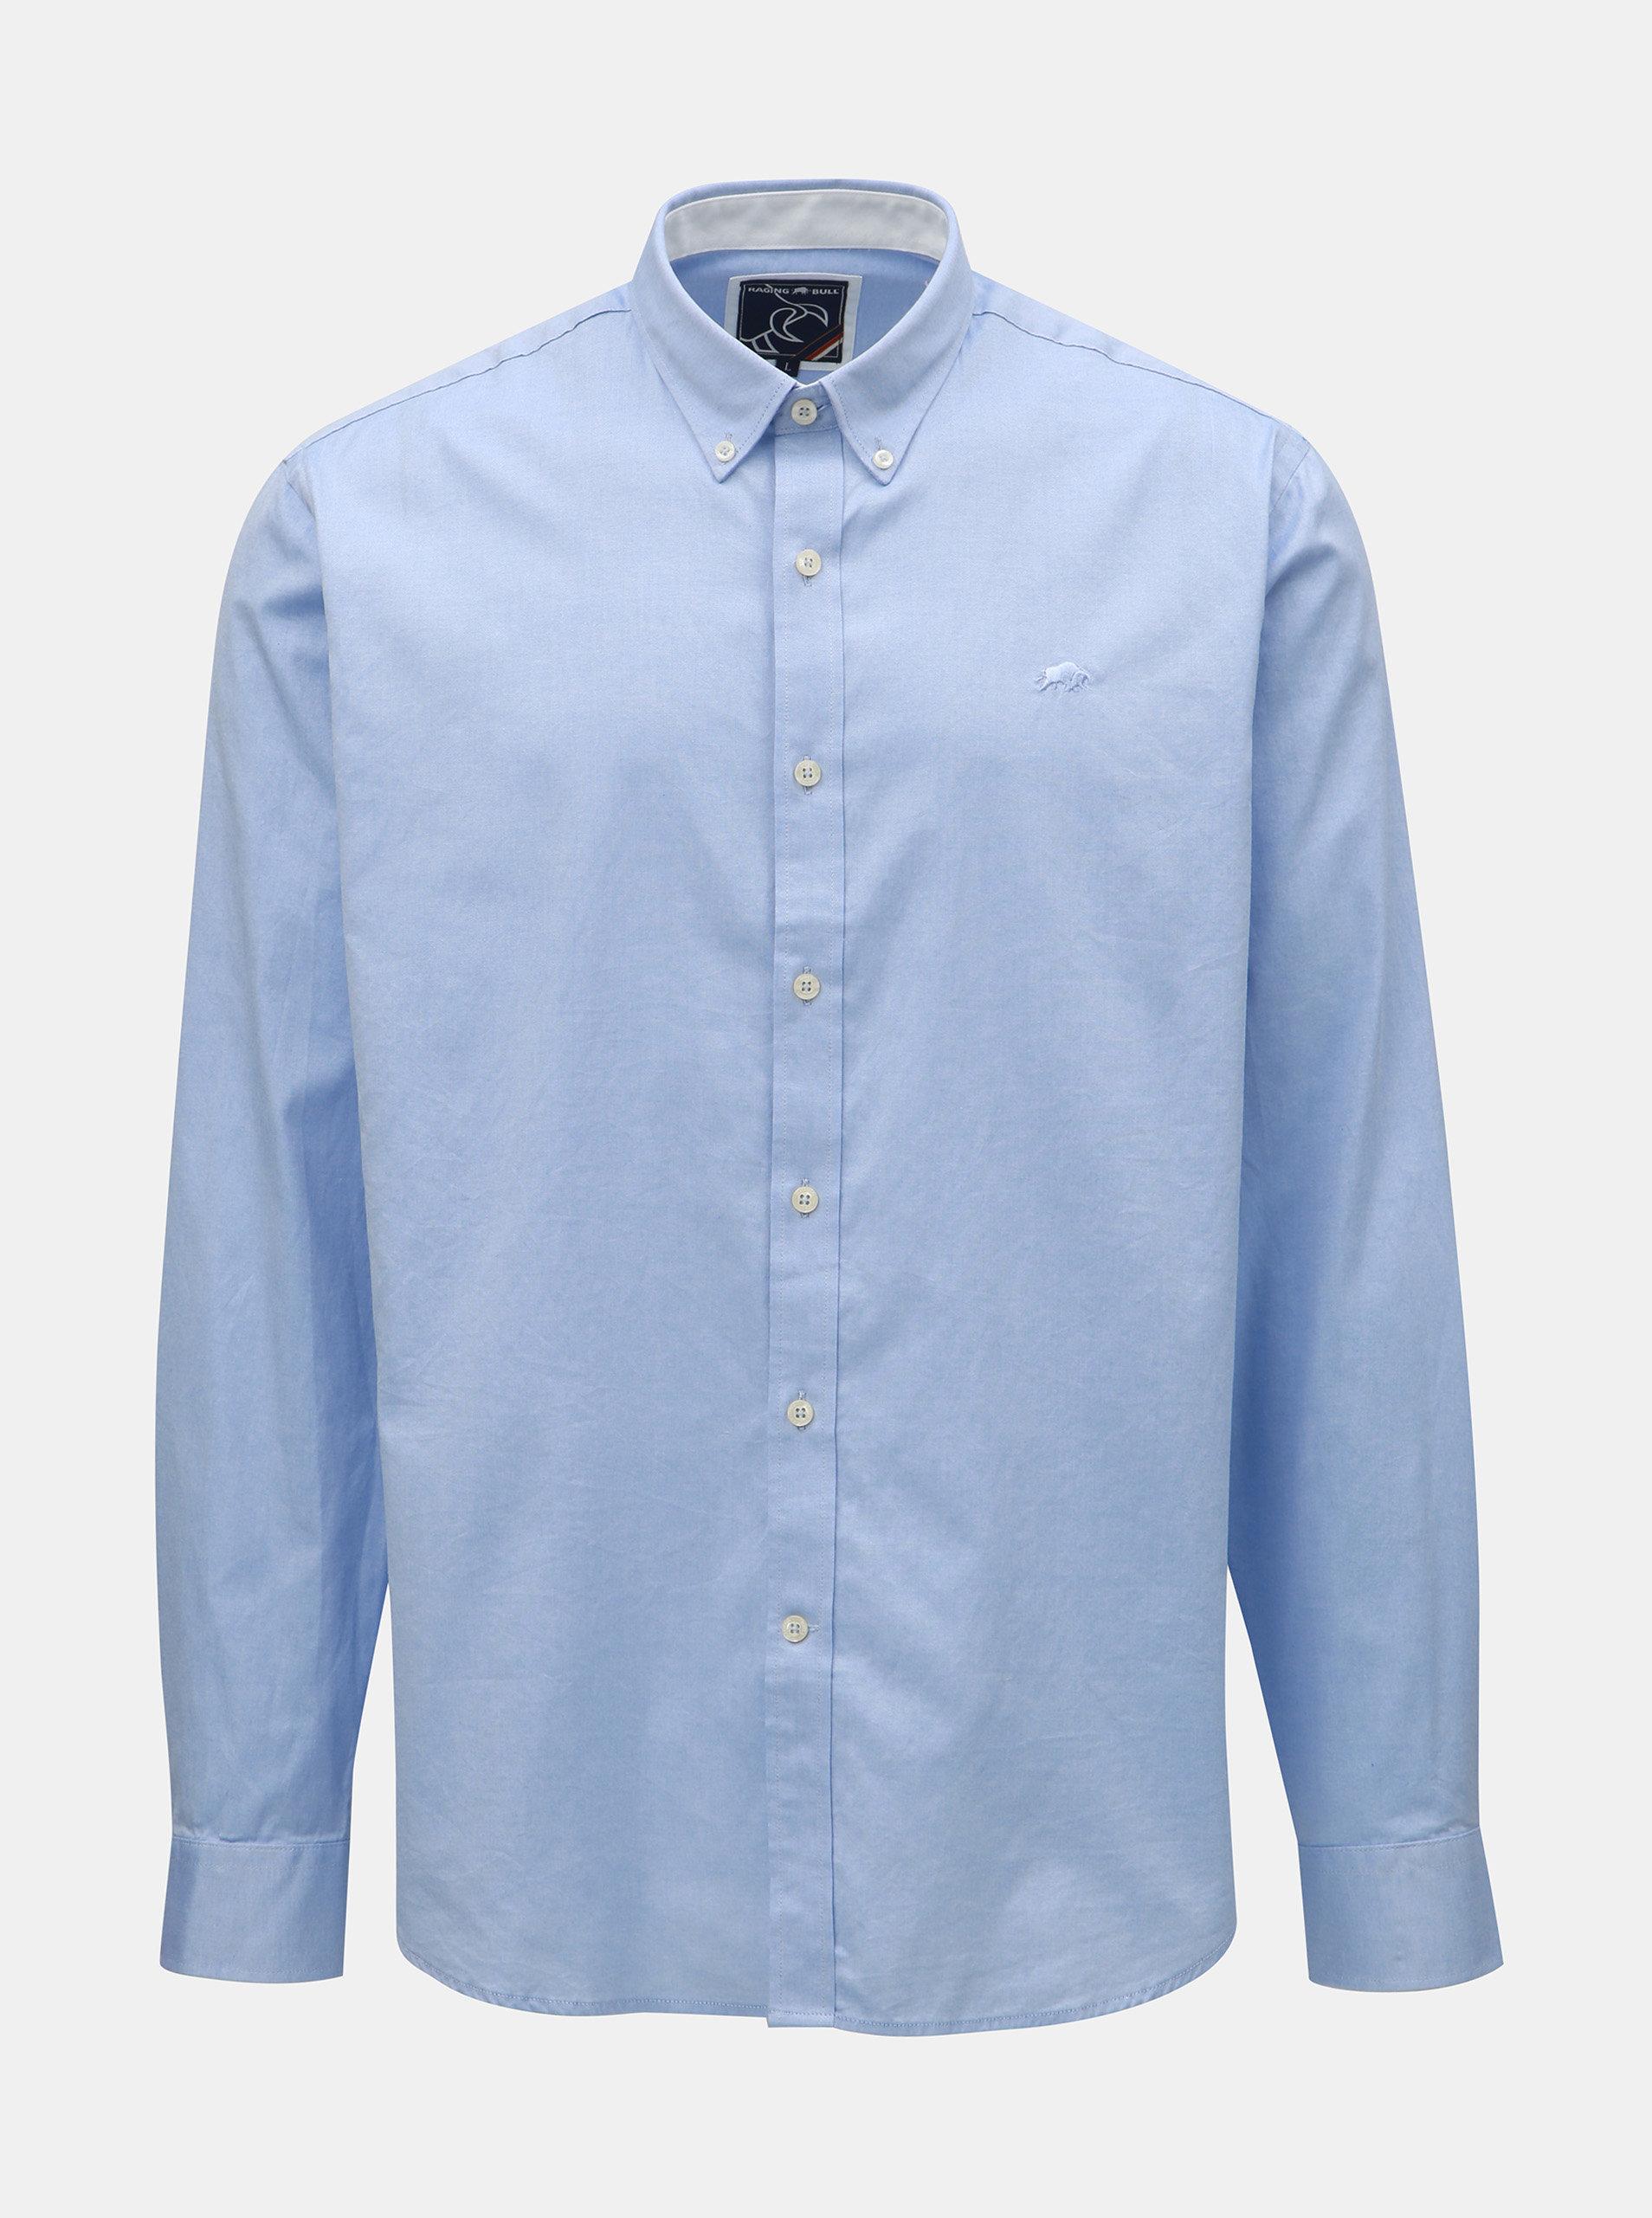 40429b99b3b Světle modrá košile s dlouhým rukávem Raging Bull ...